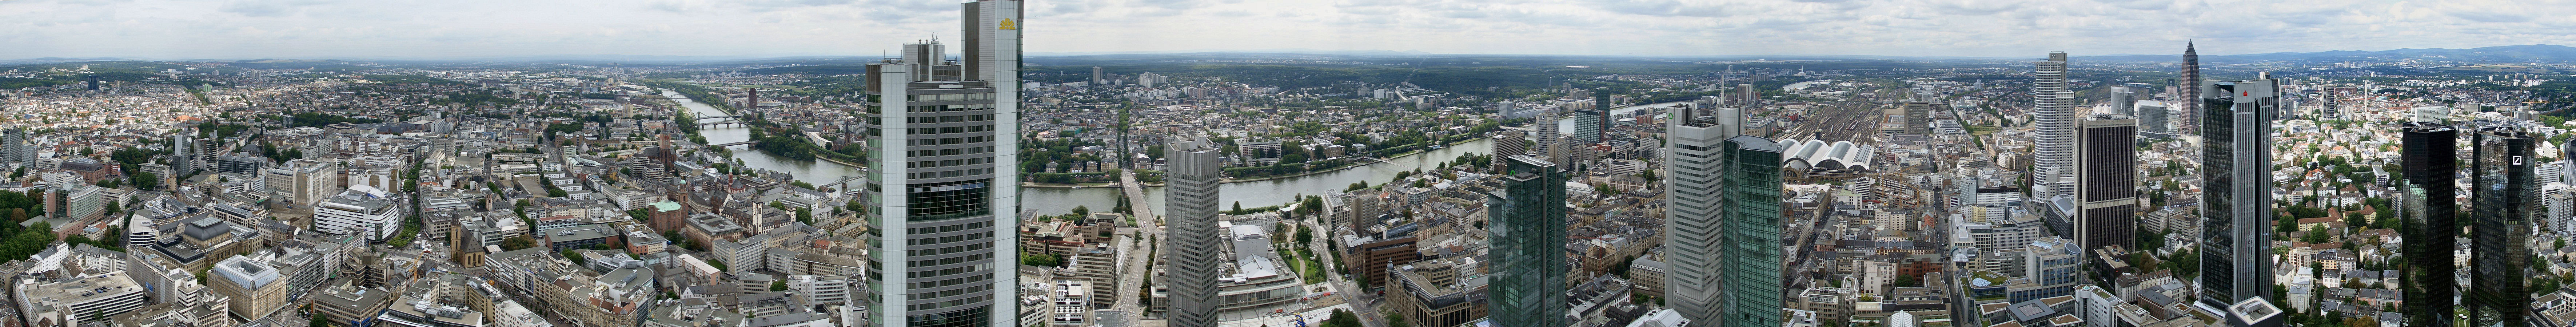 panorama_frankfurt_vom_maintower_edit